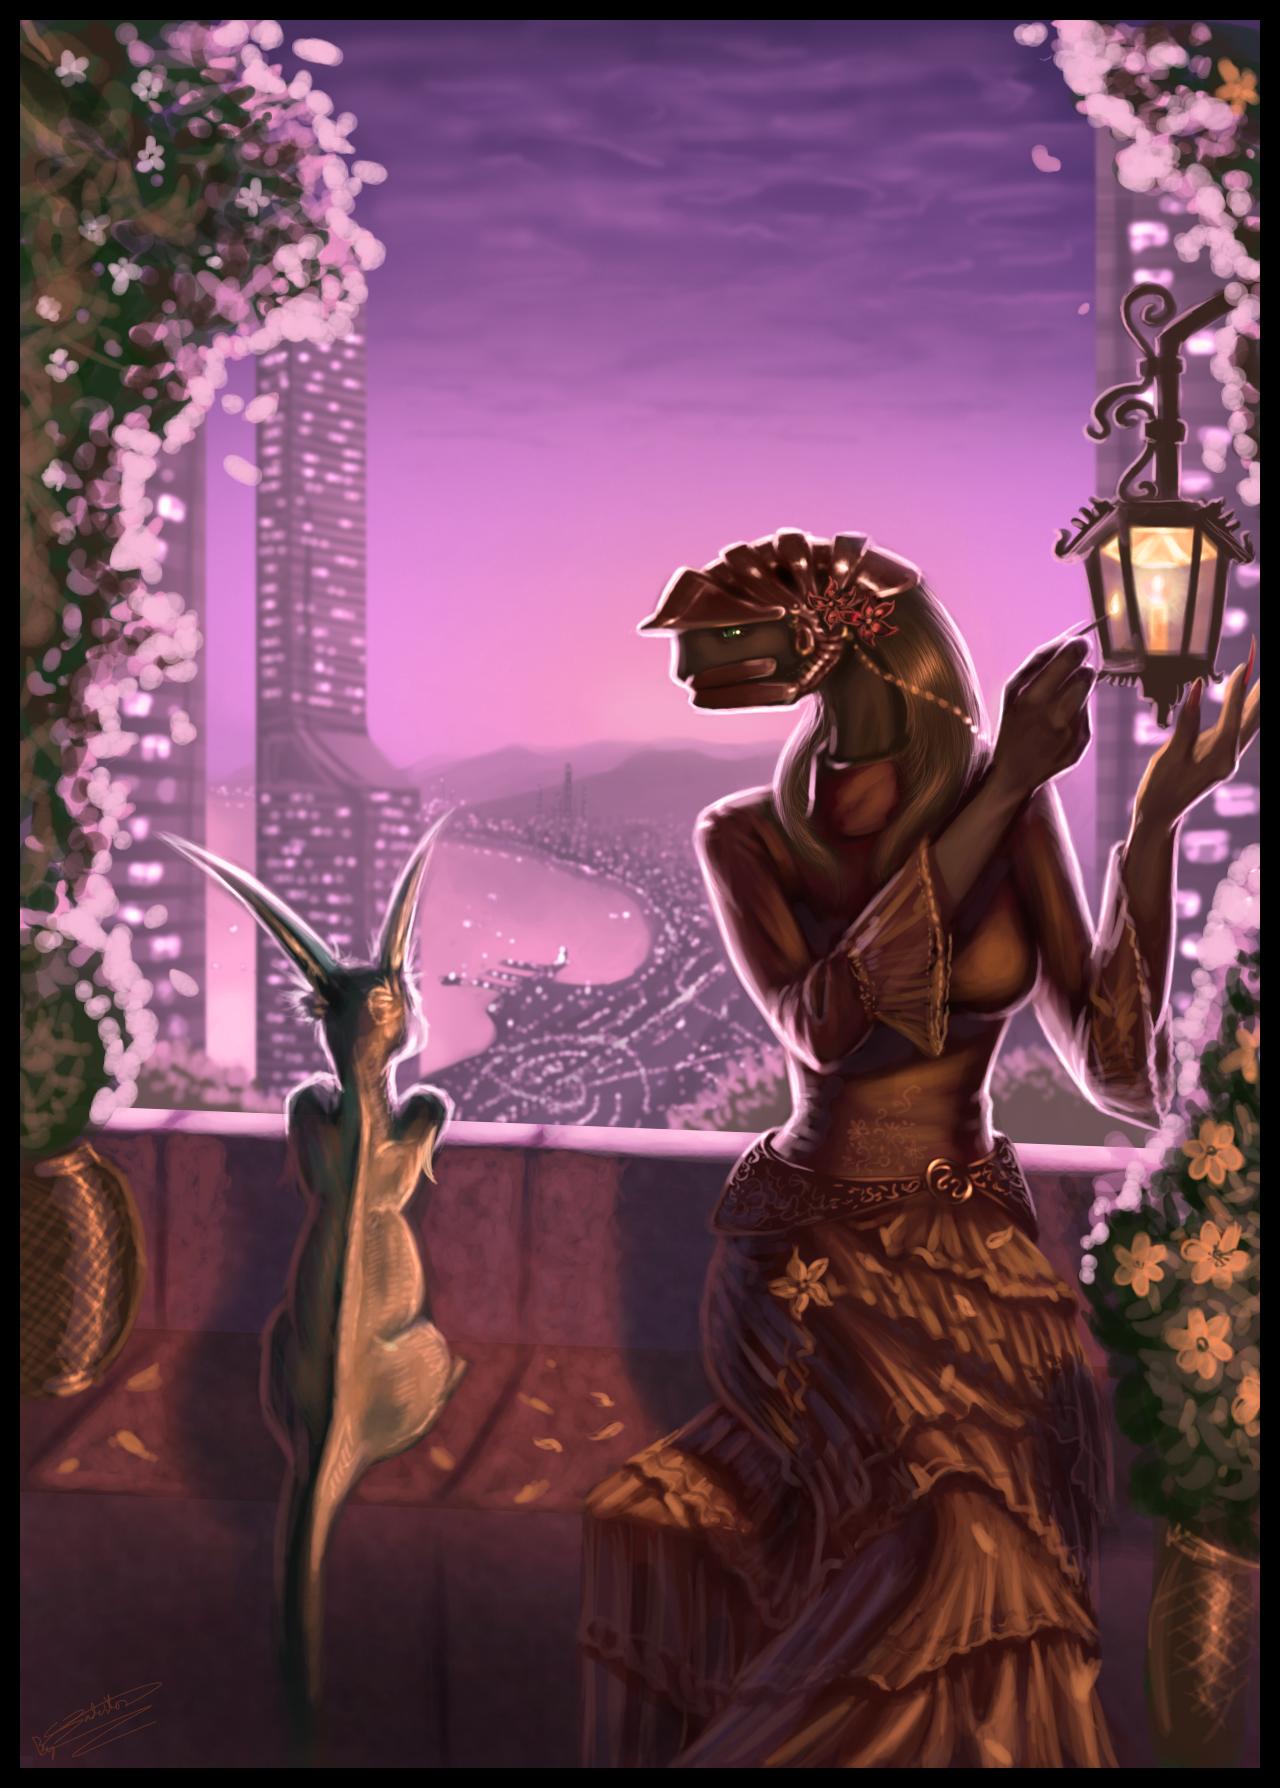 Dema-Danub and Dajam city by Jadeitor